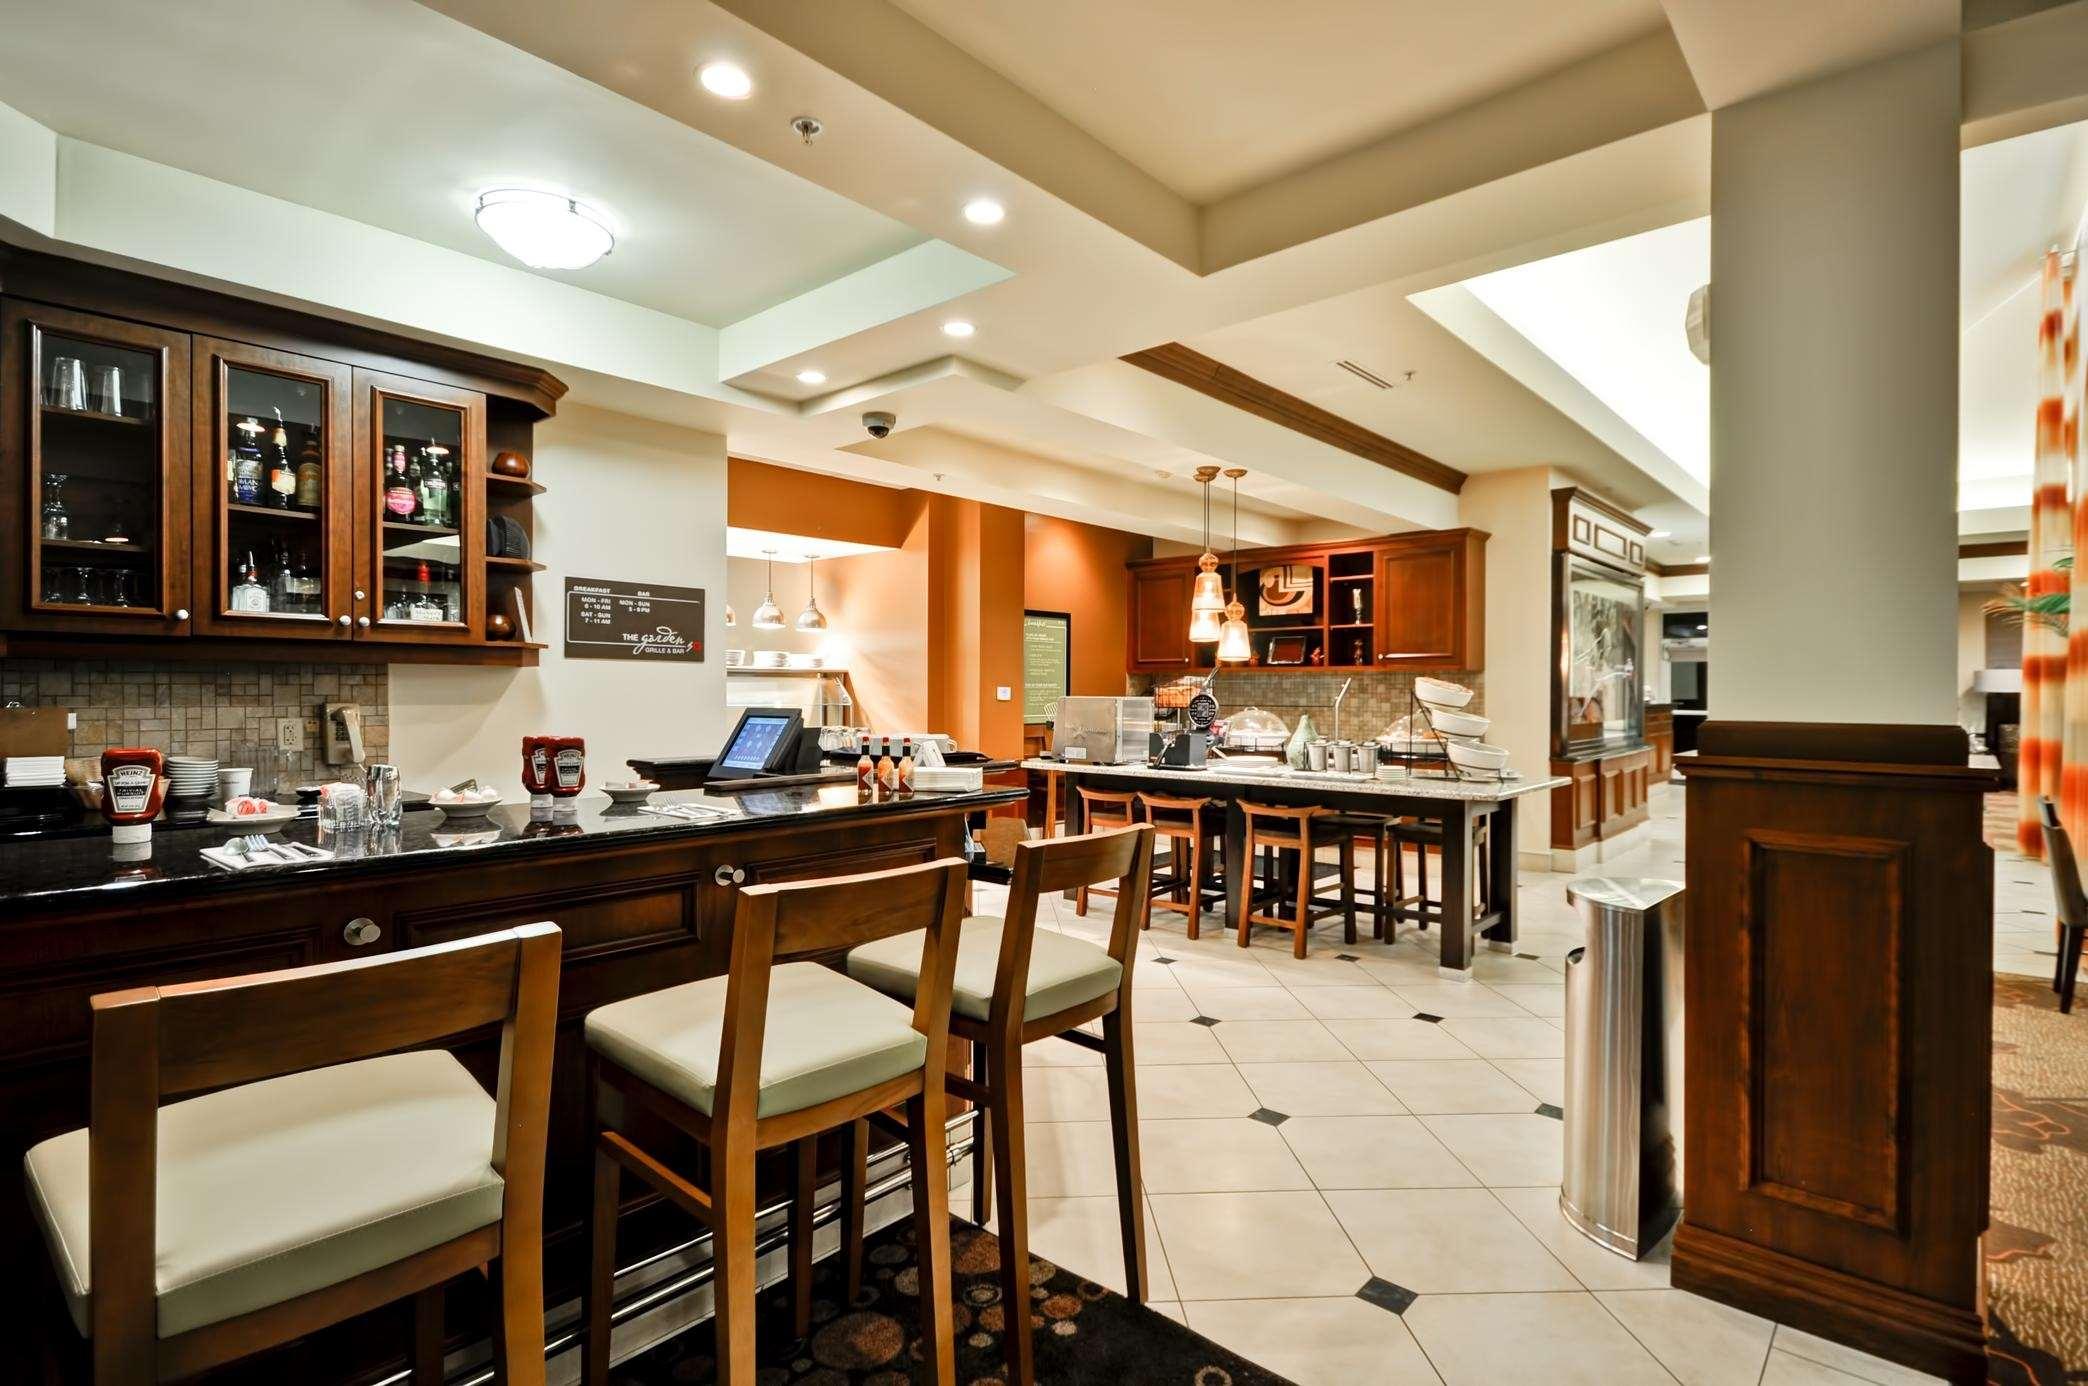 Hilton Garden Inn Tampa Northwest/Oldsmar 4052 Tampa Road Oldsmar ...